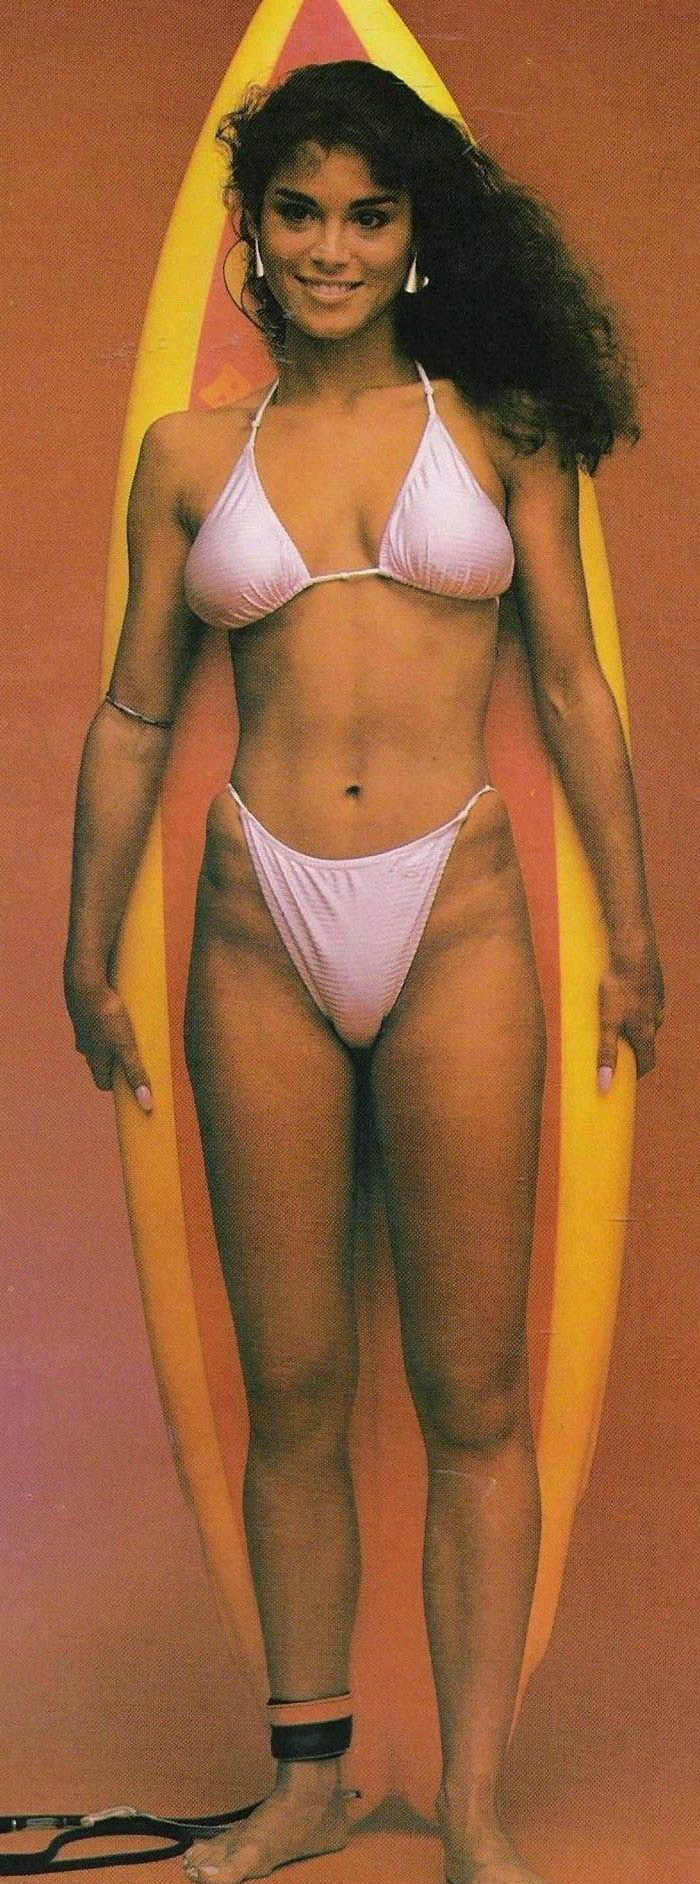 Бетси Расселл голая. Фото - 1